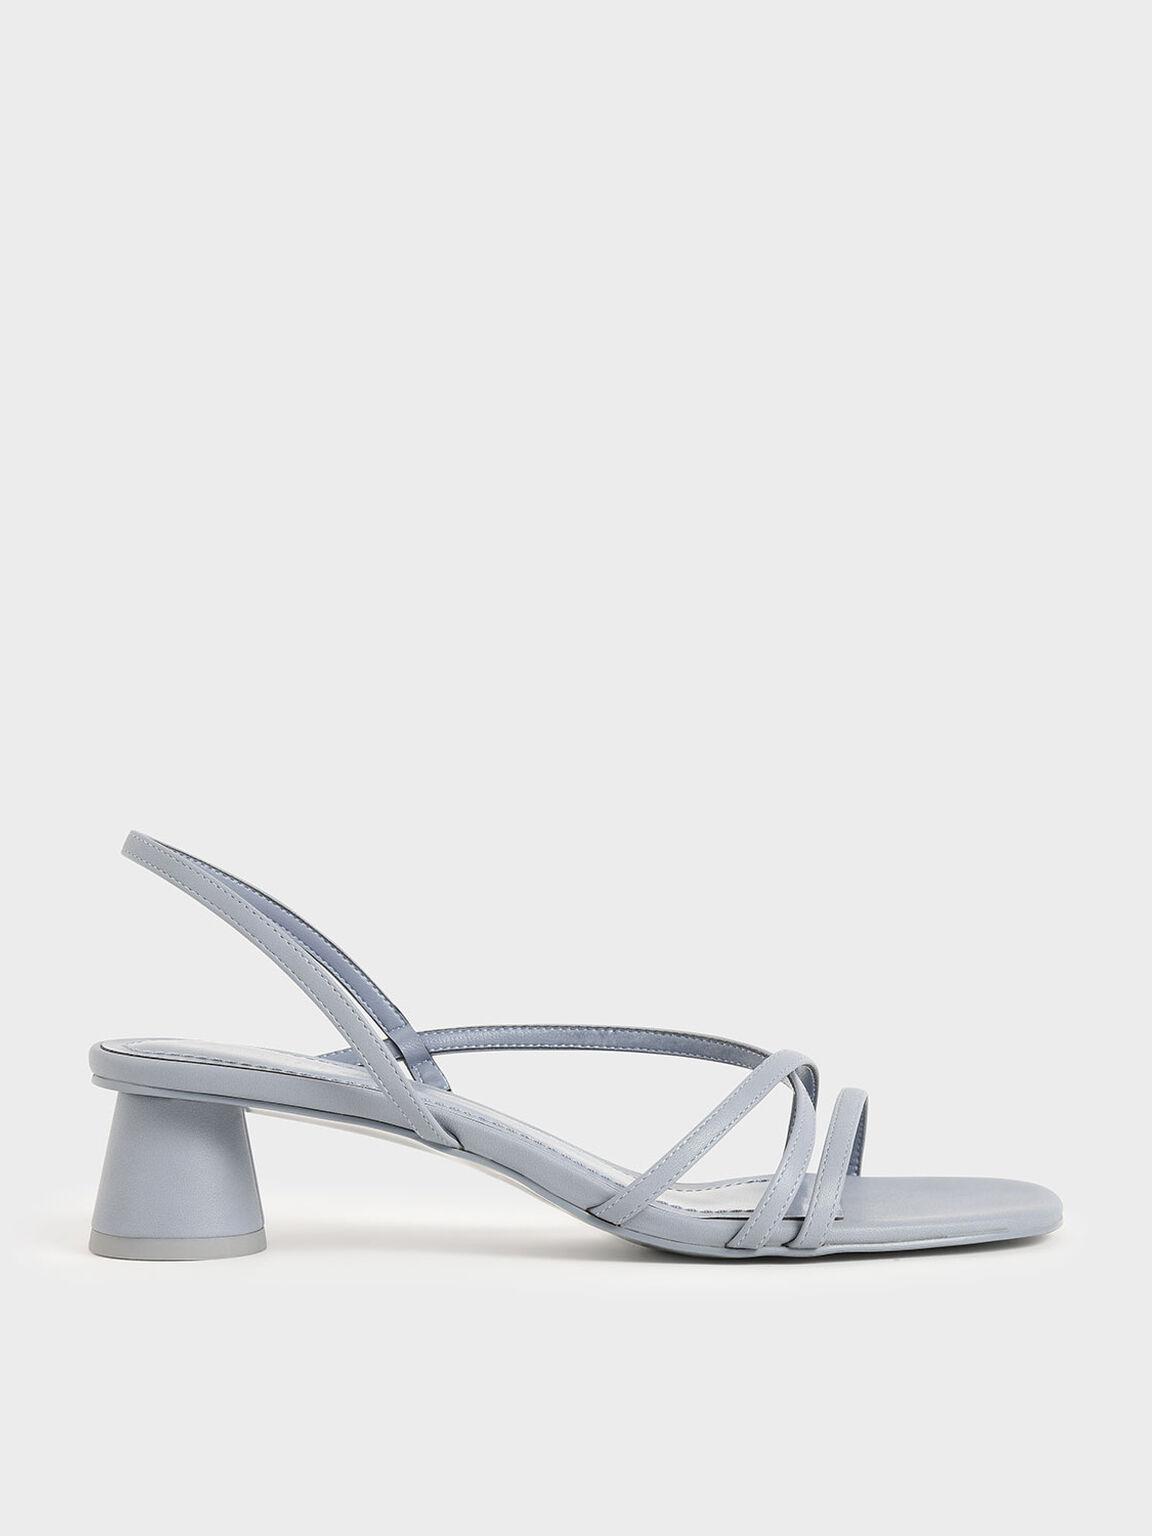 Strappy Cylindrical Heel Sandals, Light Blue, hi-res